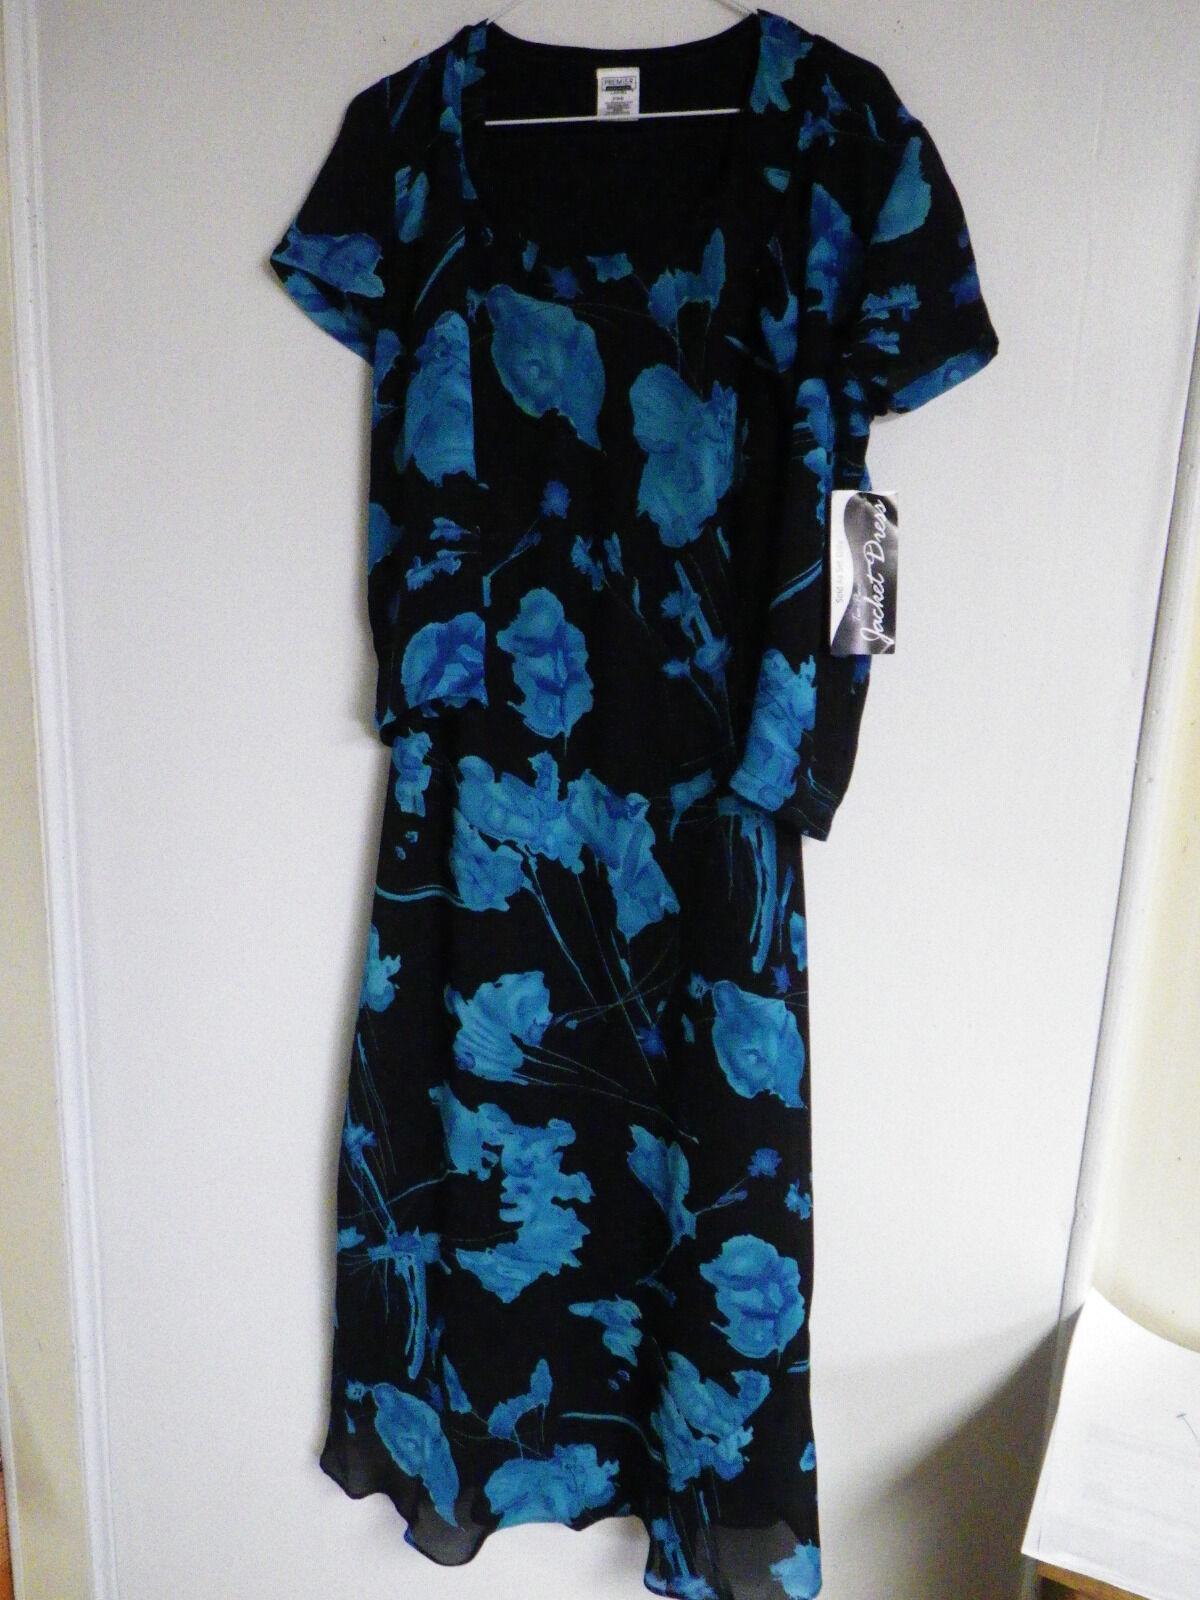 Womens clothingJacket Dress Premier International Chiffon Party Sheer Floral S